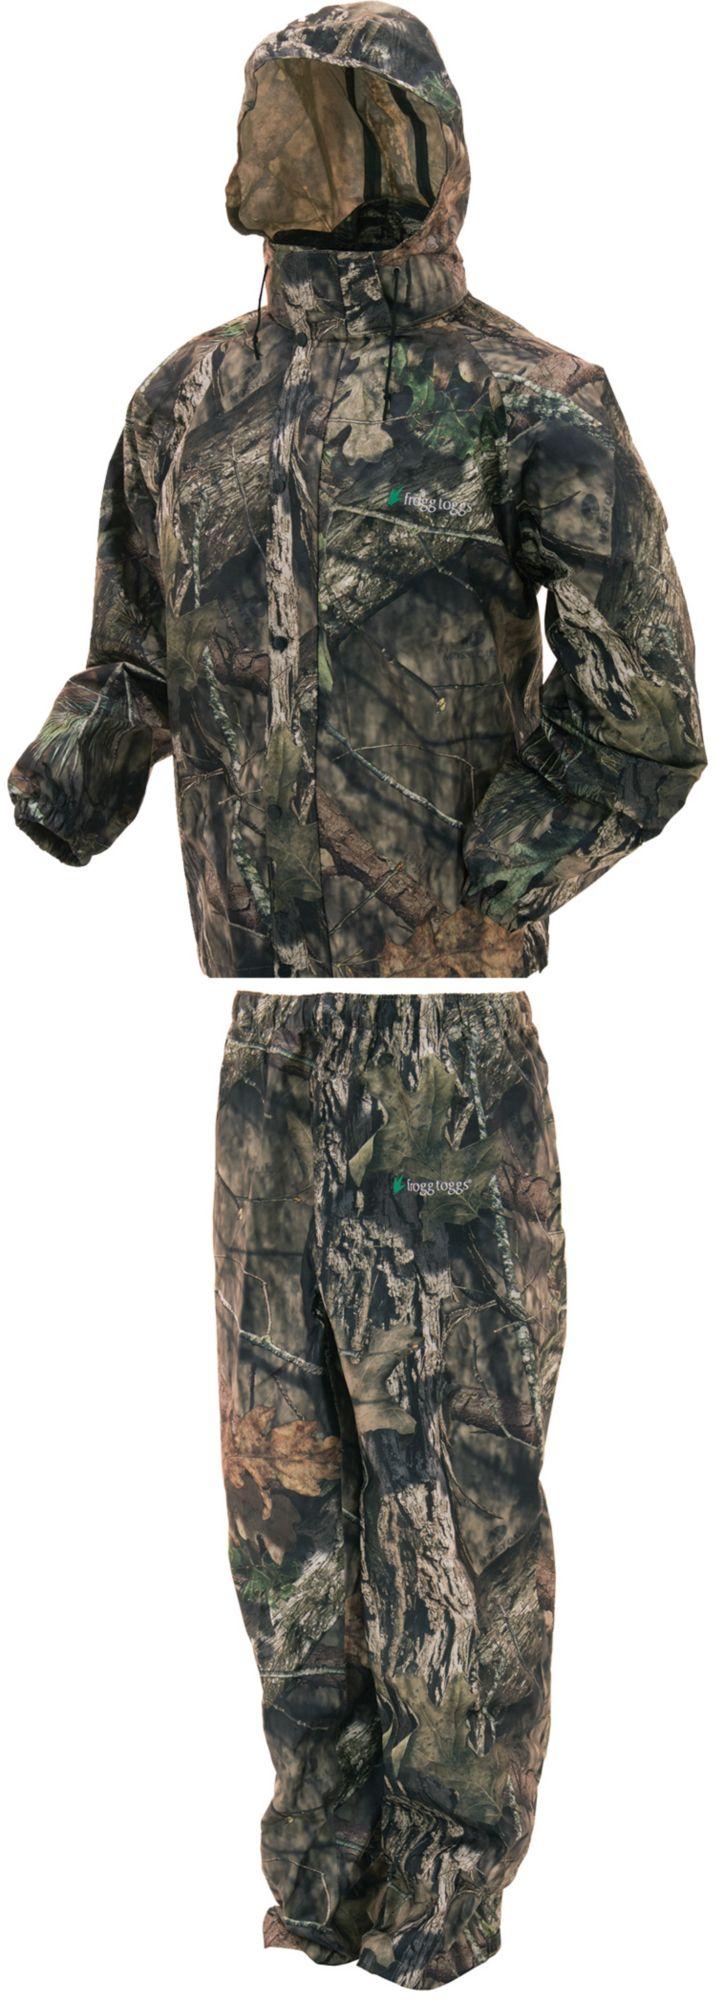 frogg toggs Men's All Sport Camo Rain Suit, Size: Medium, Brown thumbnail